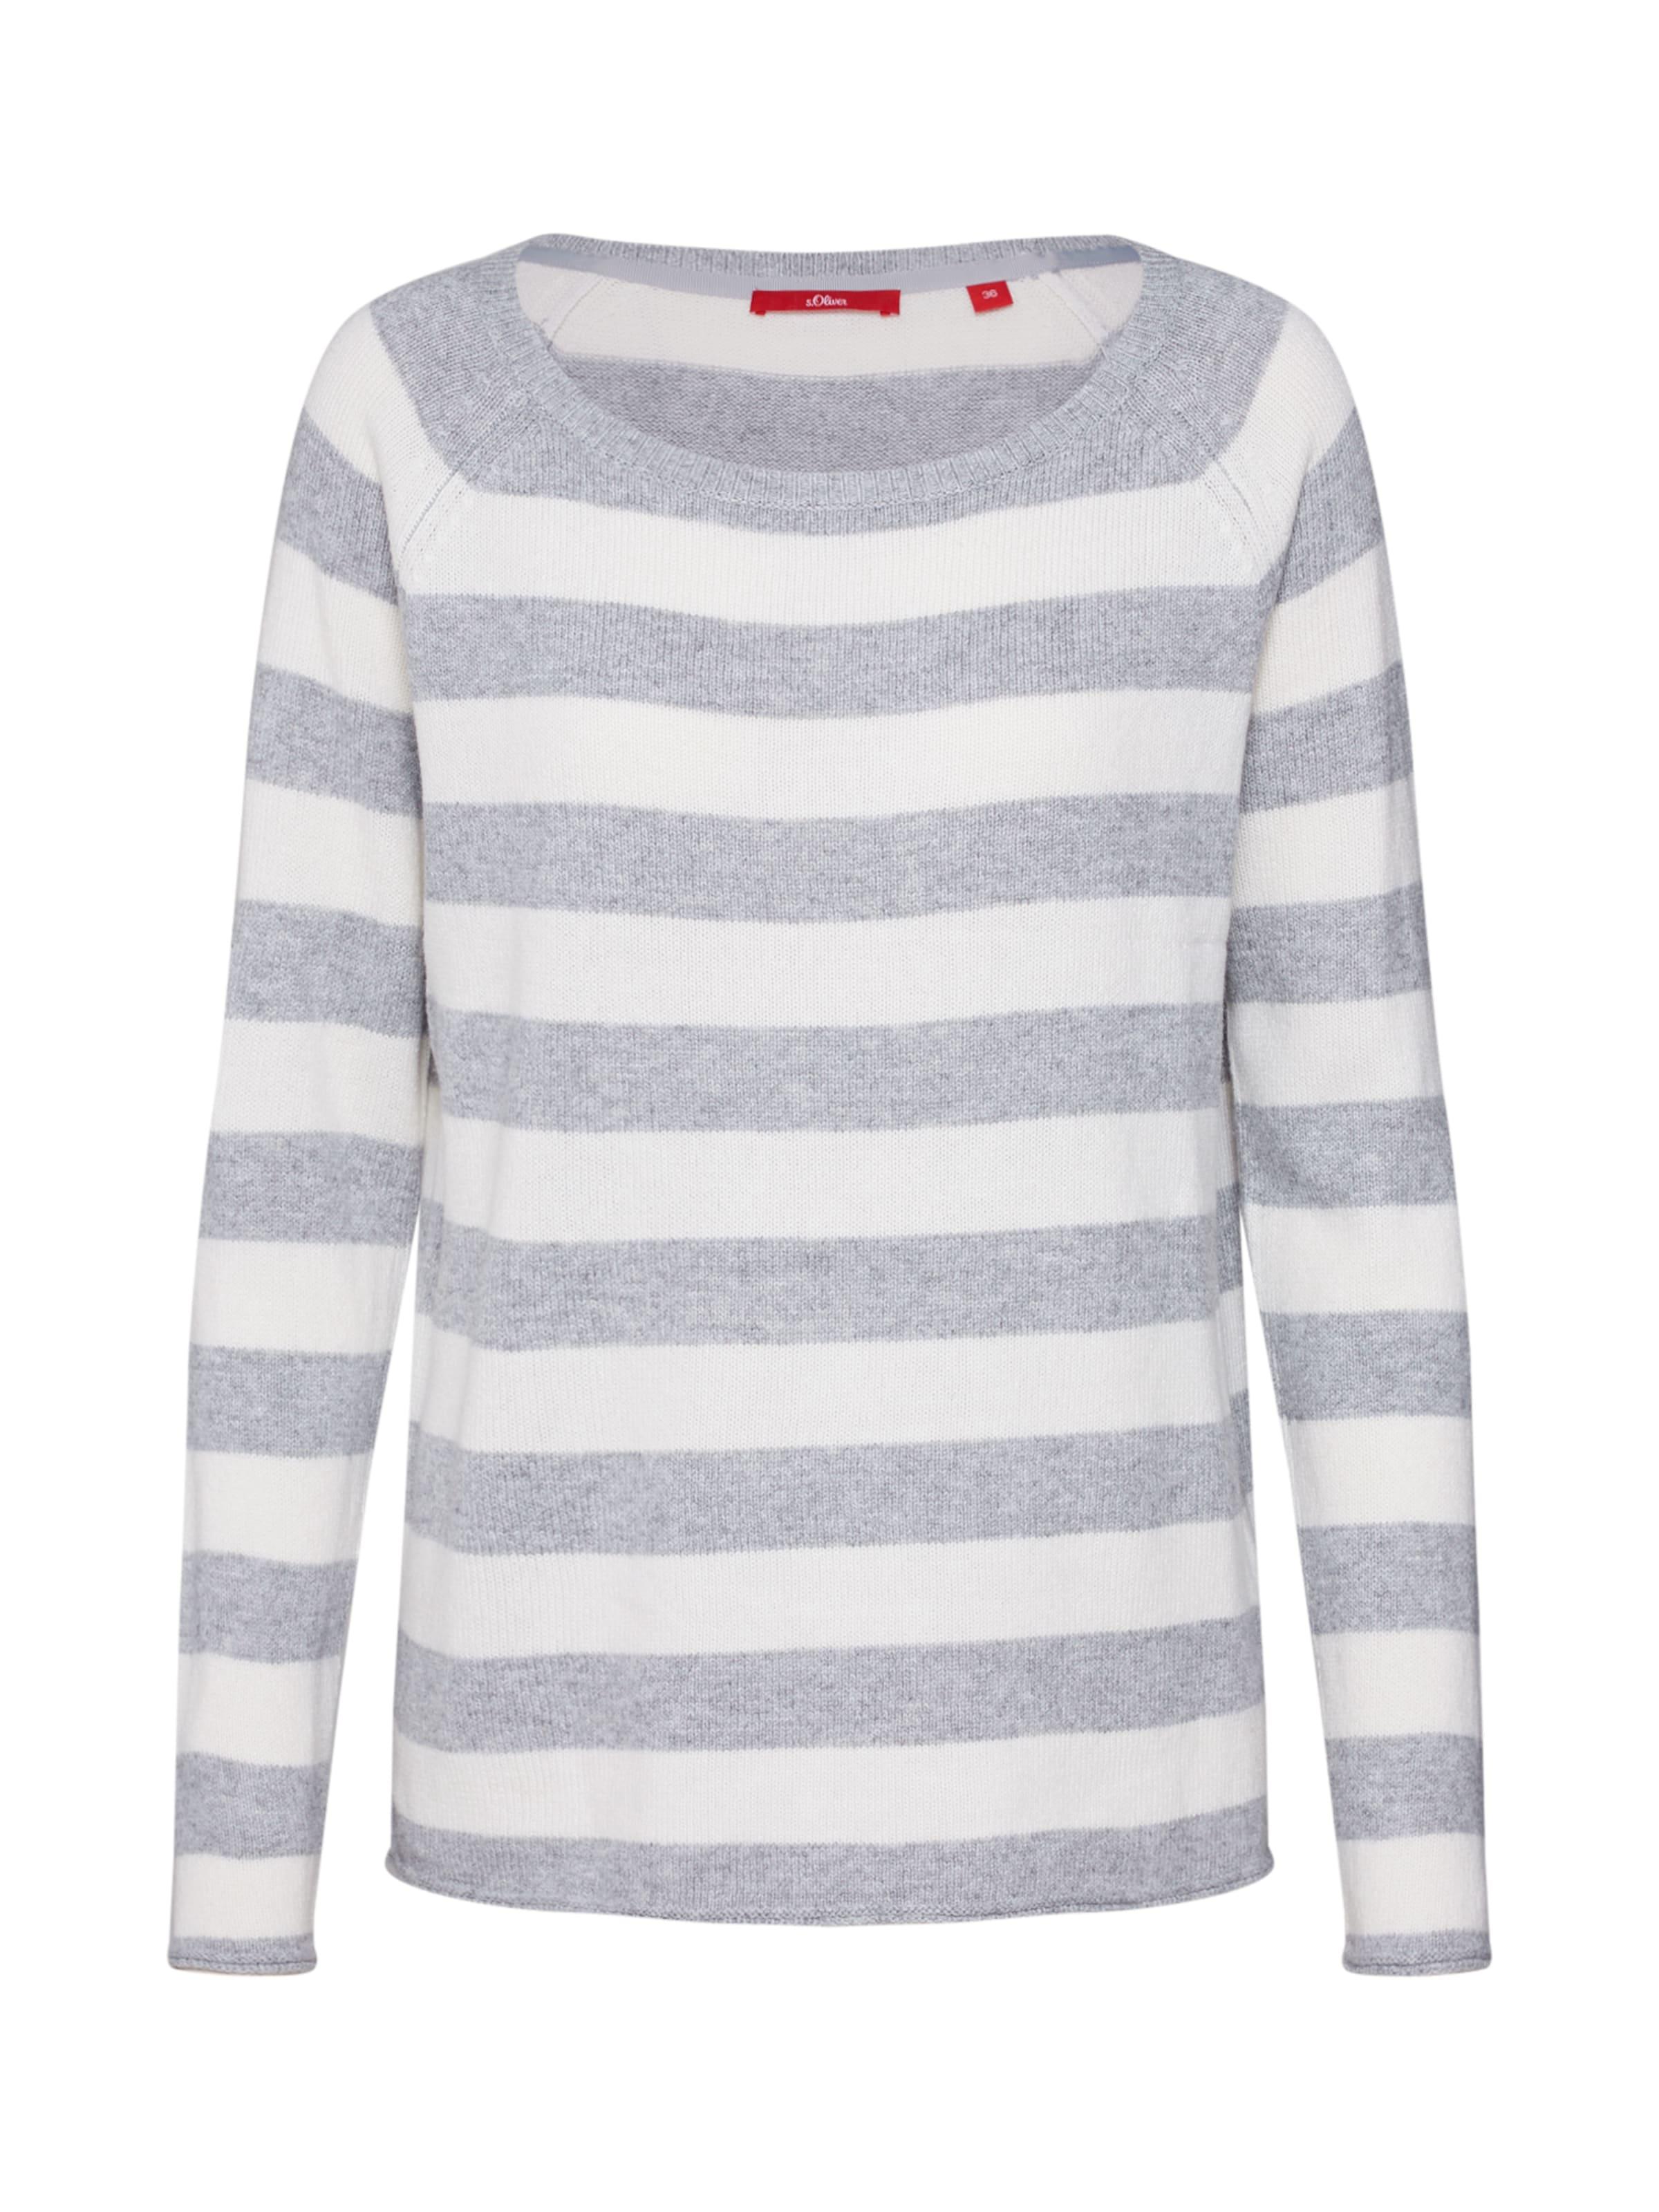 Label Red oliver S GrauWei Pullover In lFKc1J